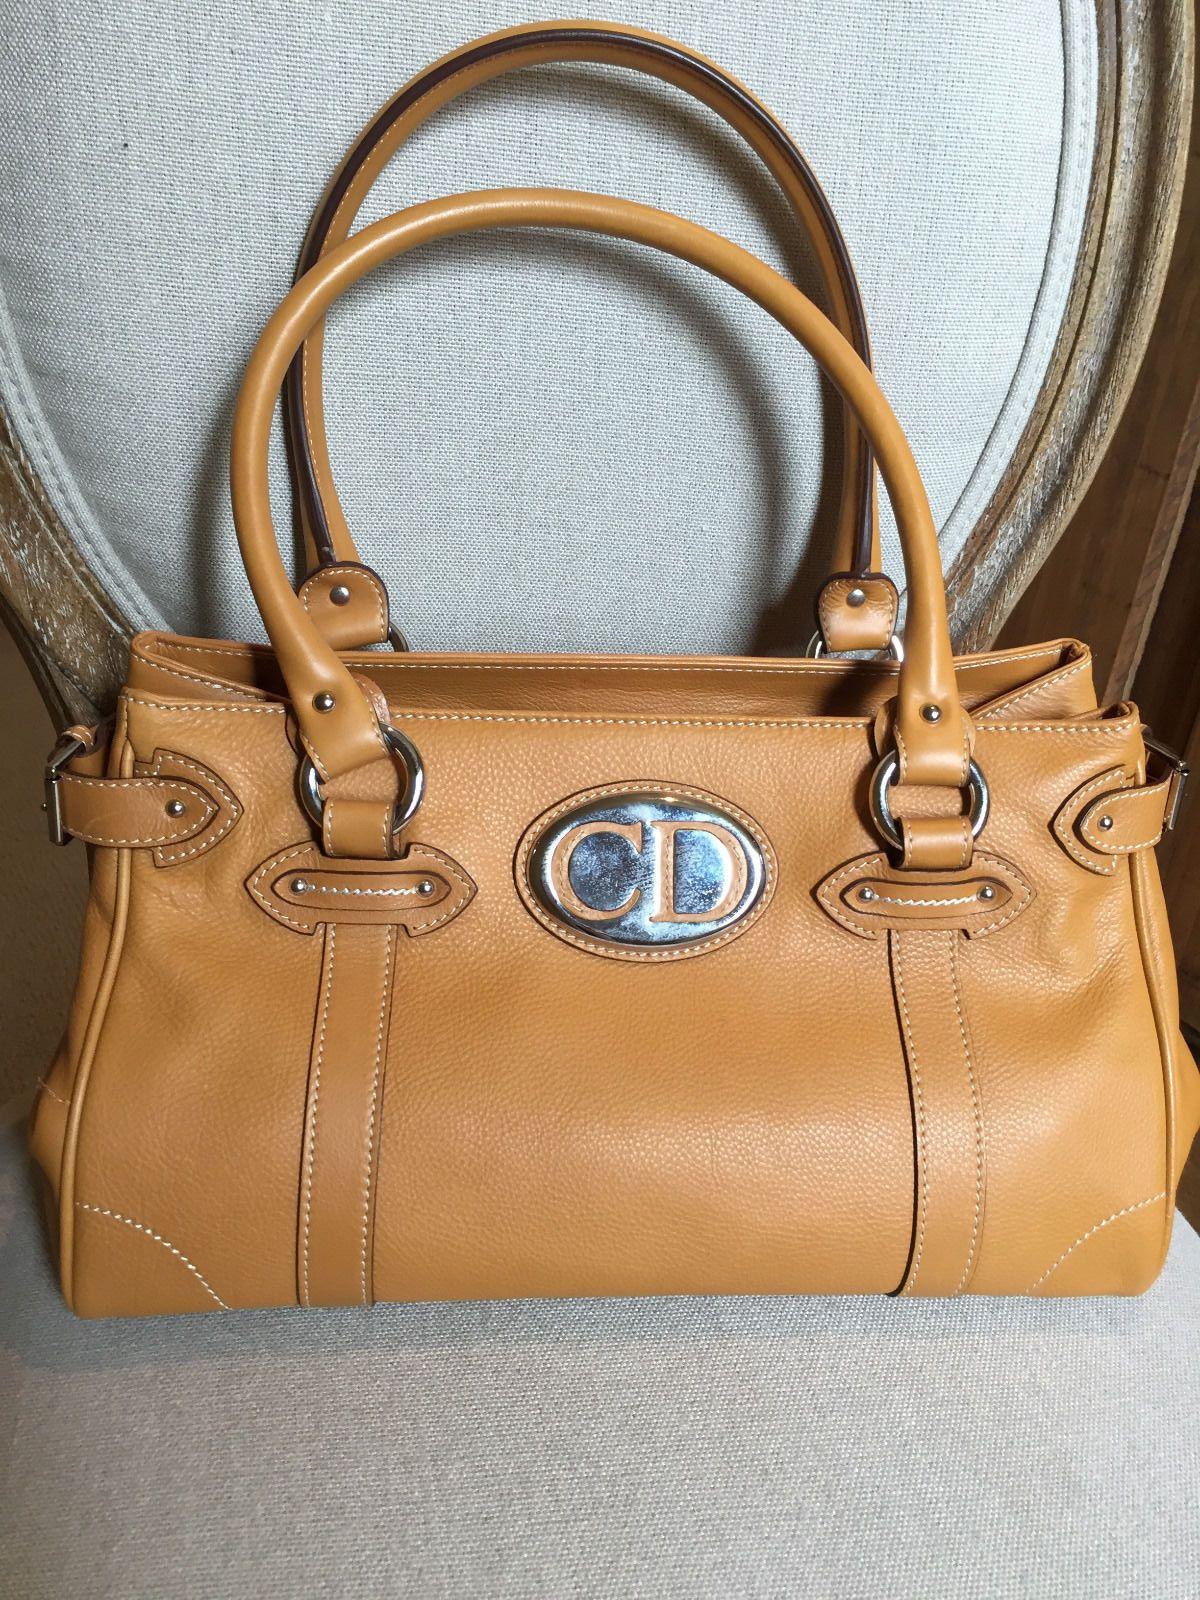 Dior Camel Leather Satchel Handbag Ebay